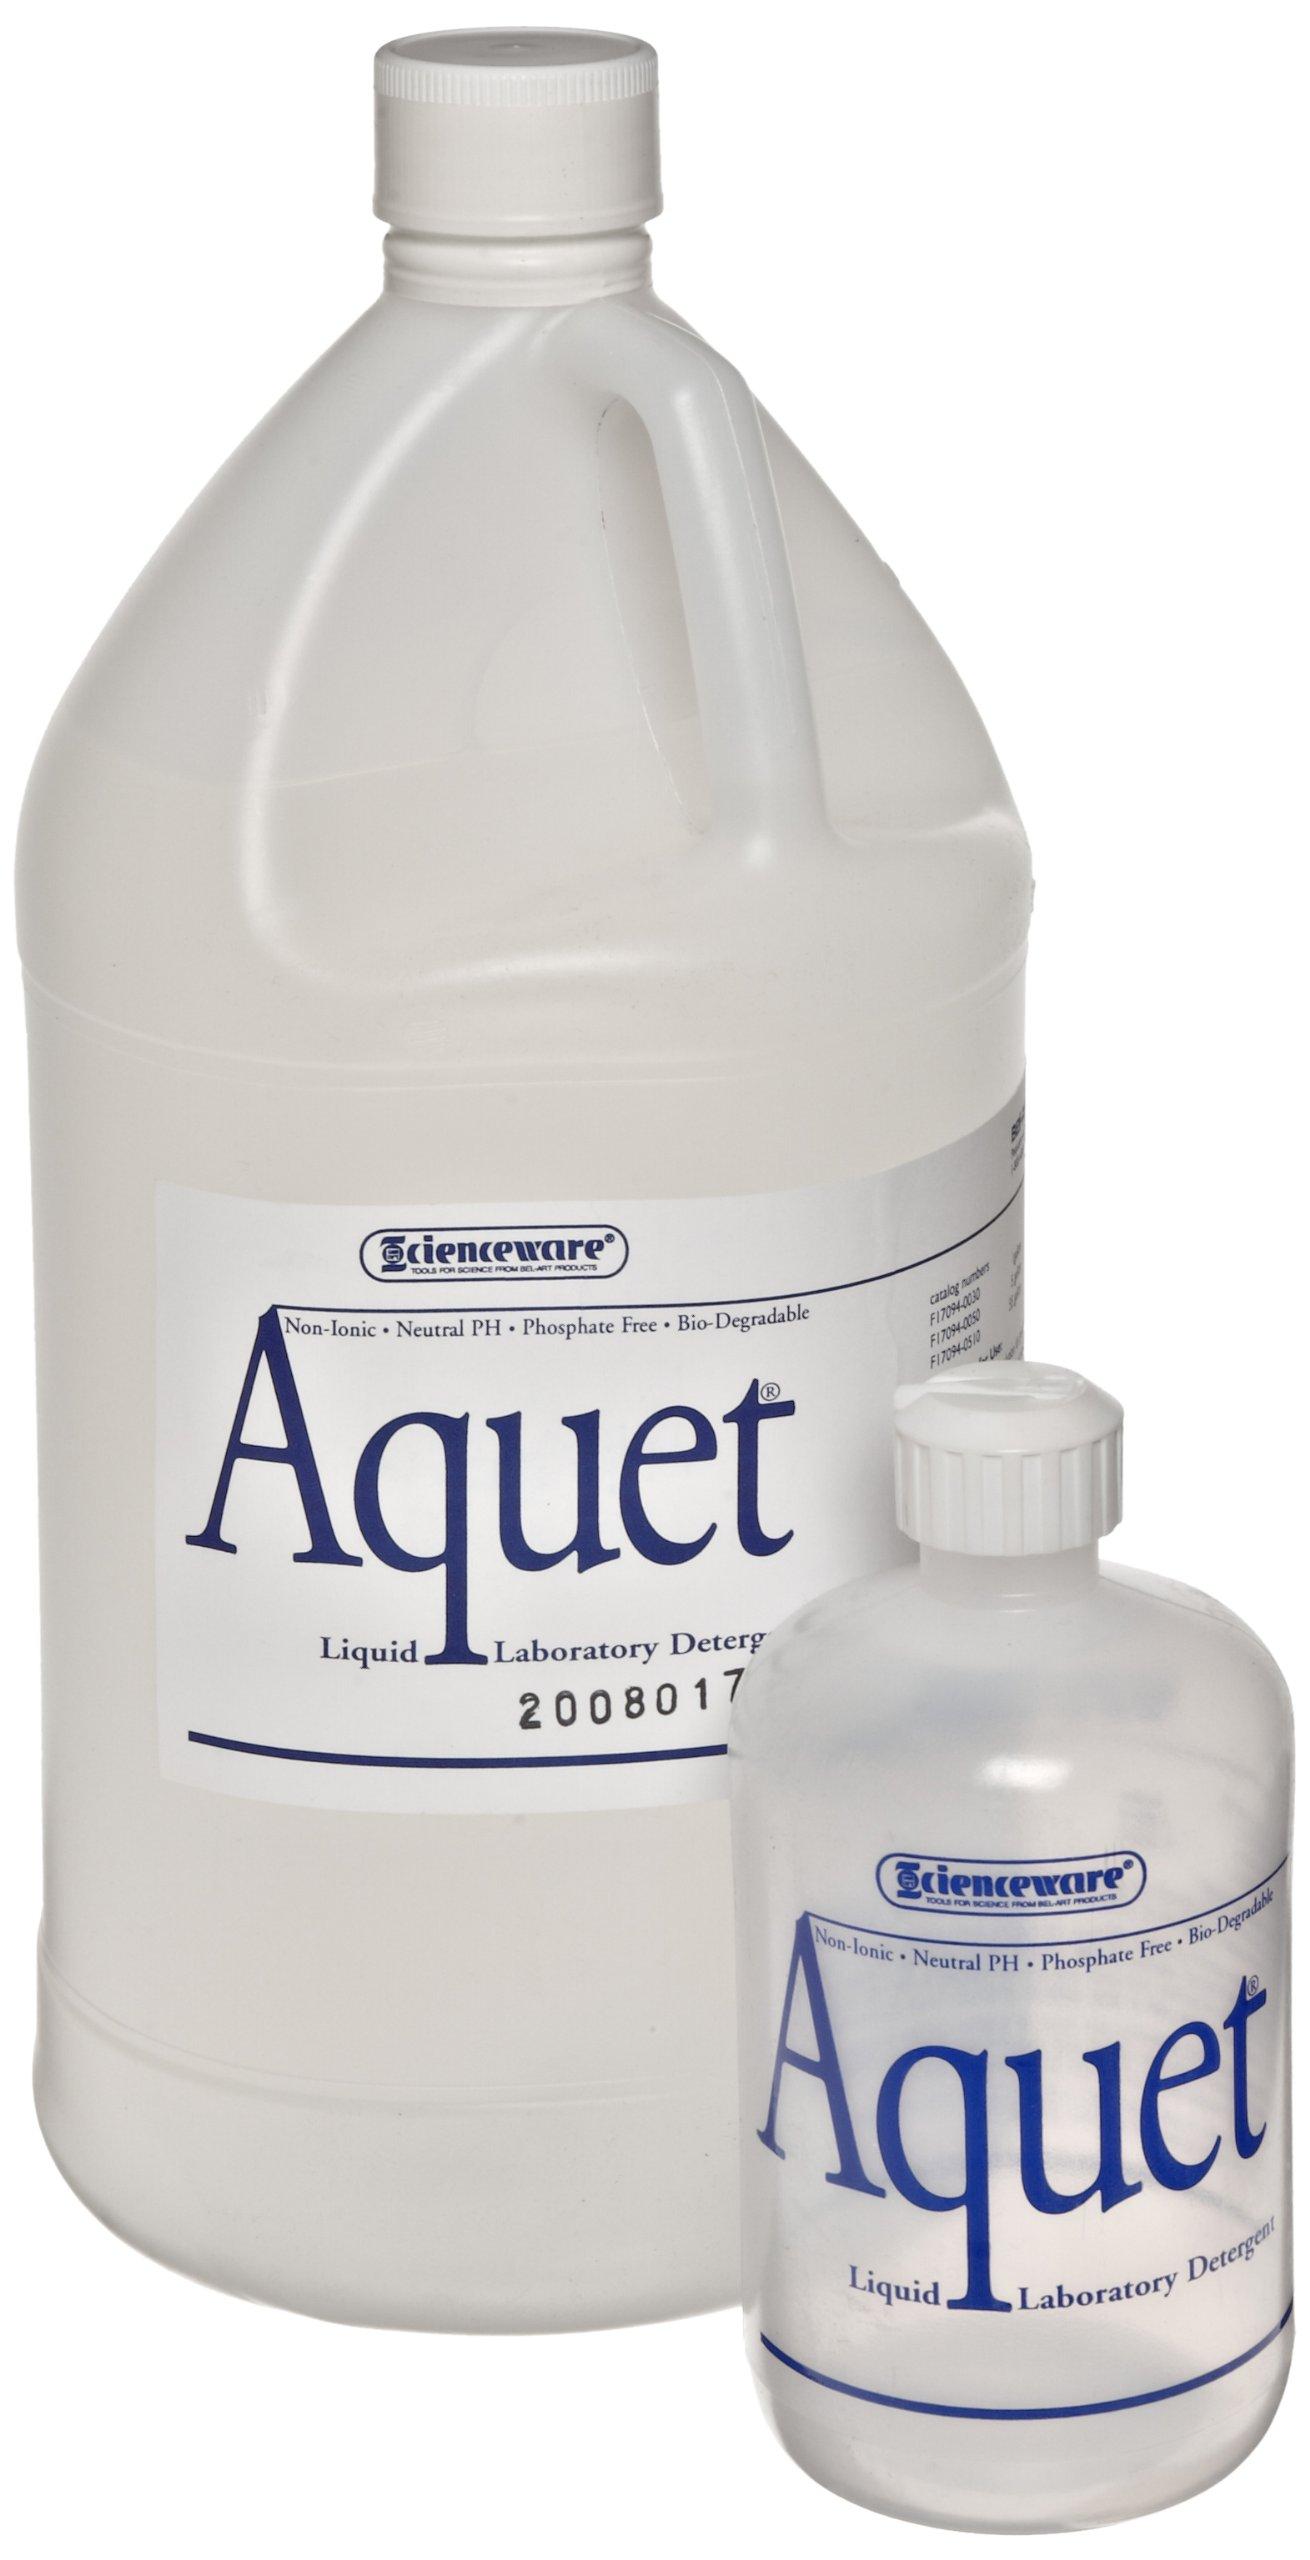 Bel-Art Aquet Detergent for Glassware and Plastics; 1 Gallon Bottle (F17094-0030) by SP Scienceware